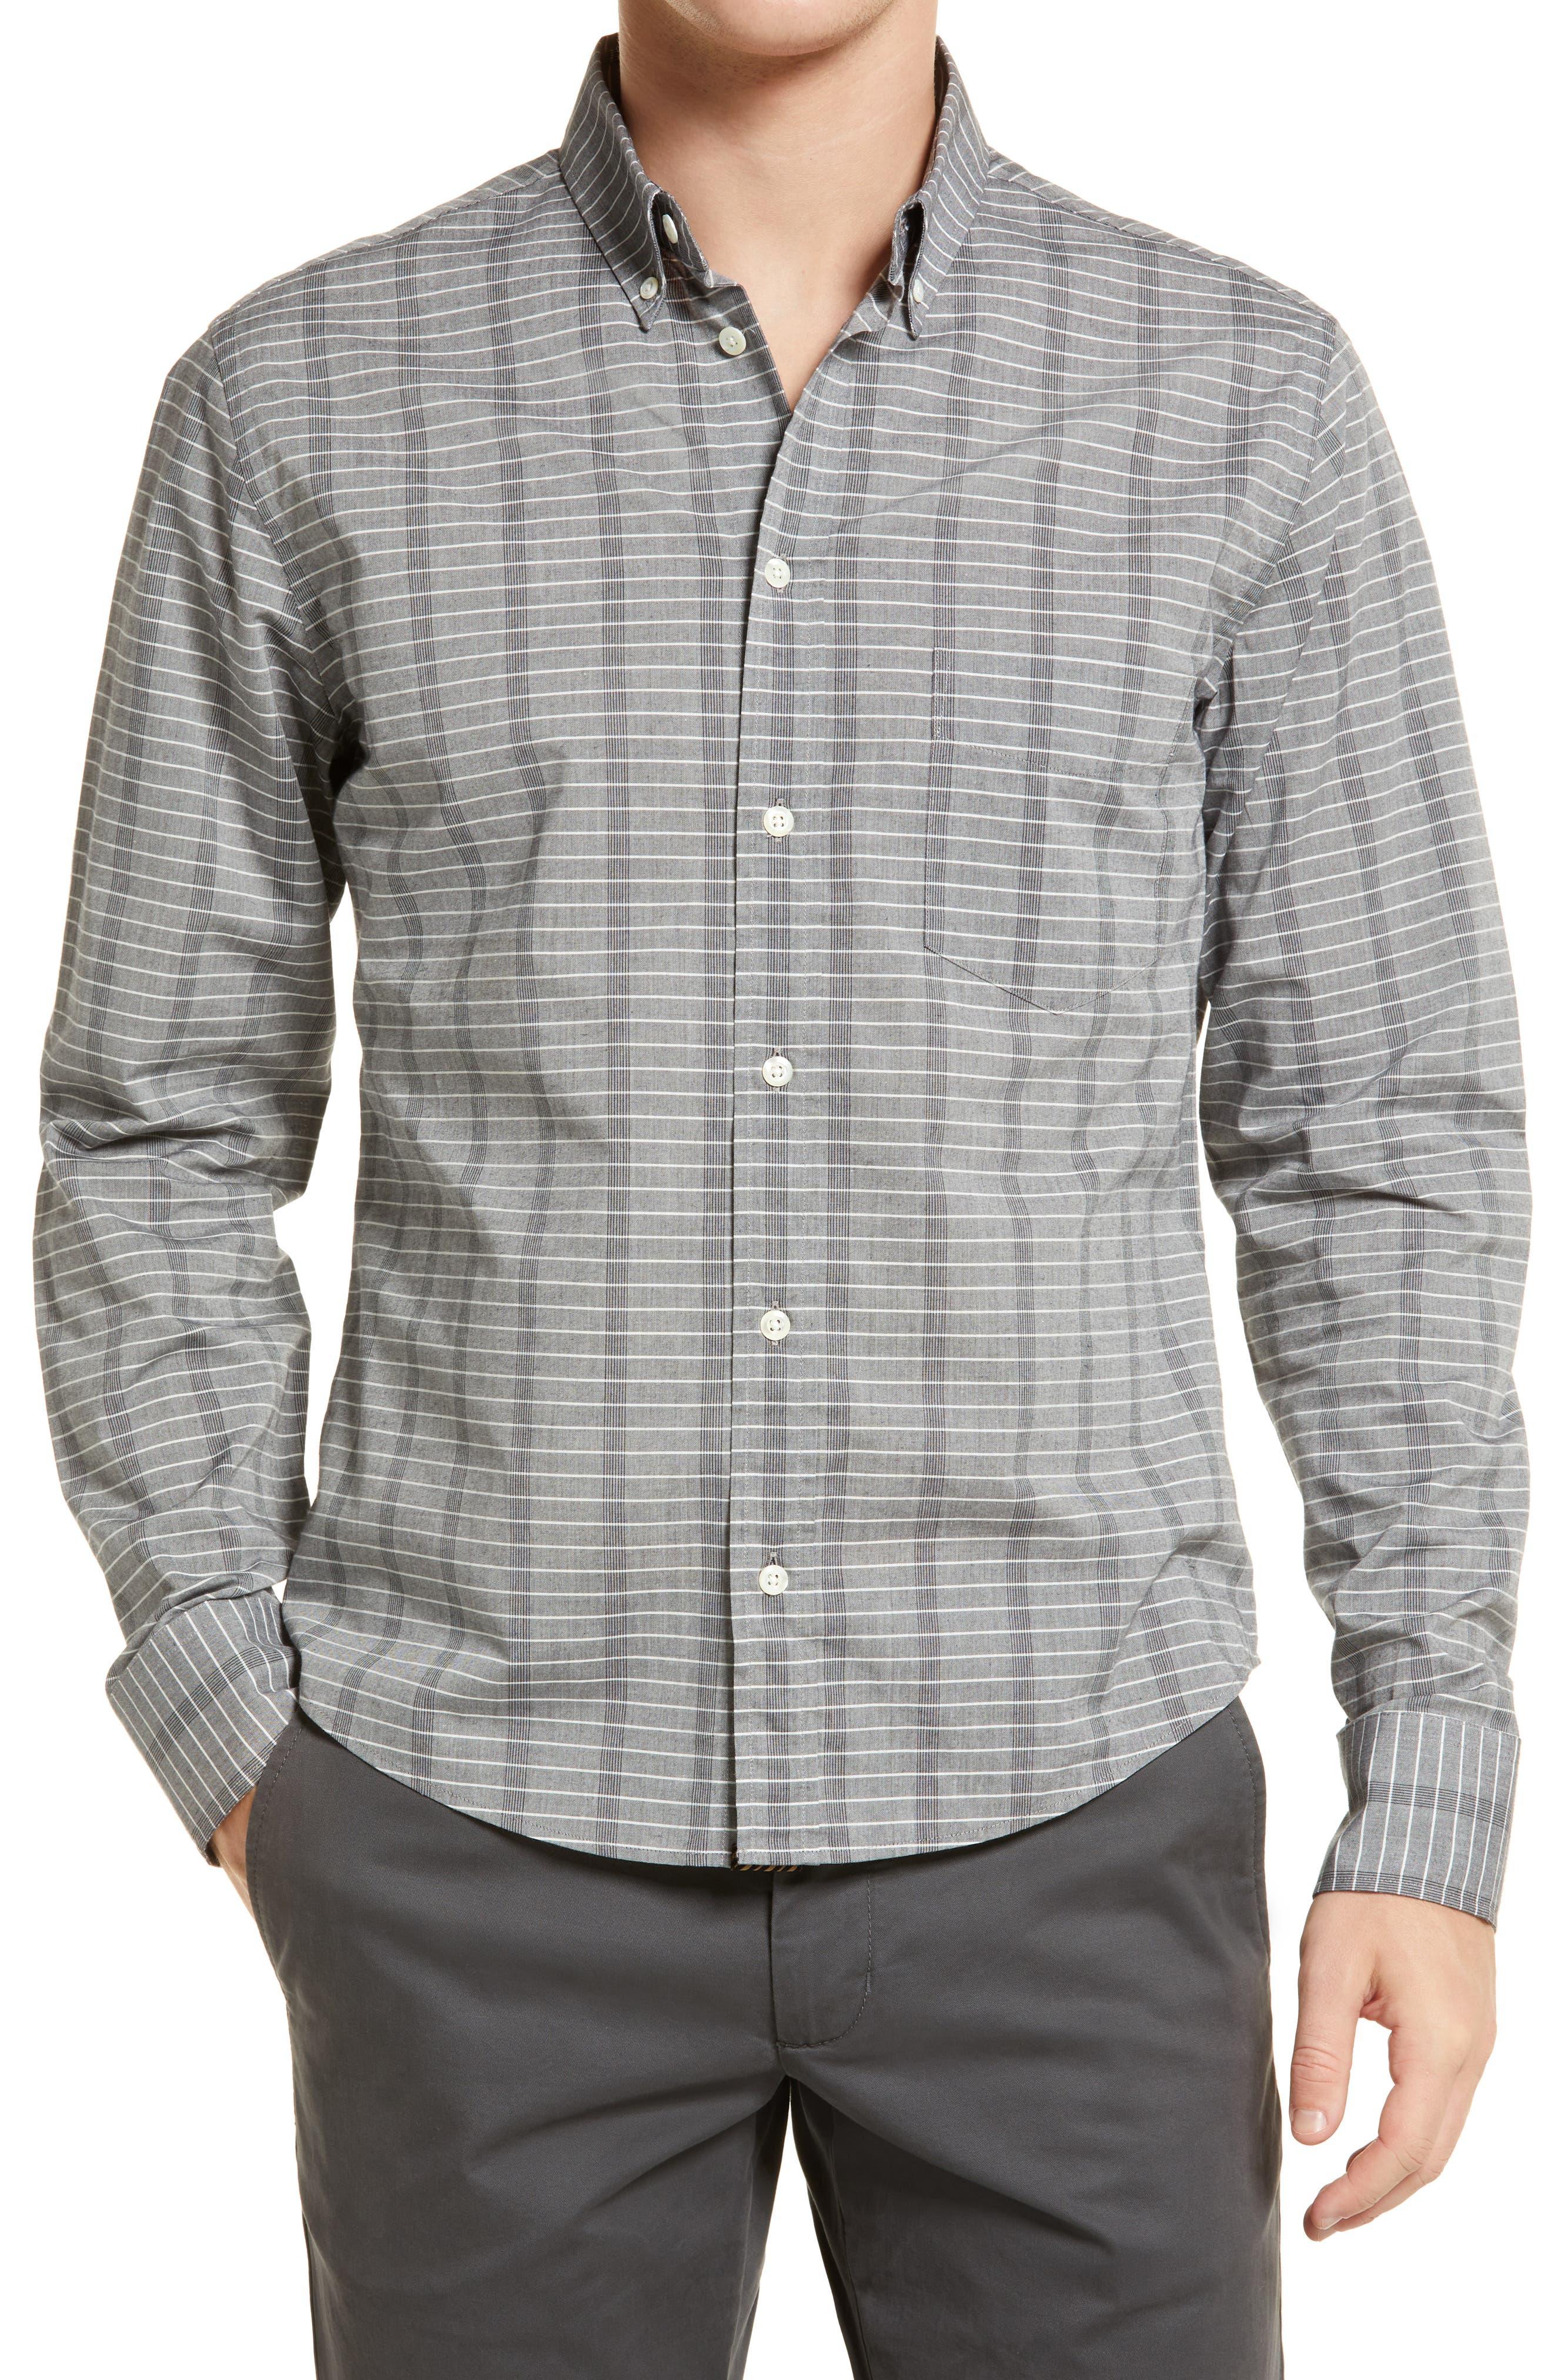 Tuscumbia Slim Fit Button-Down Shirt